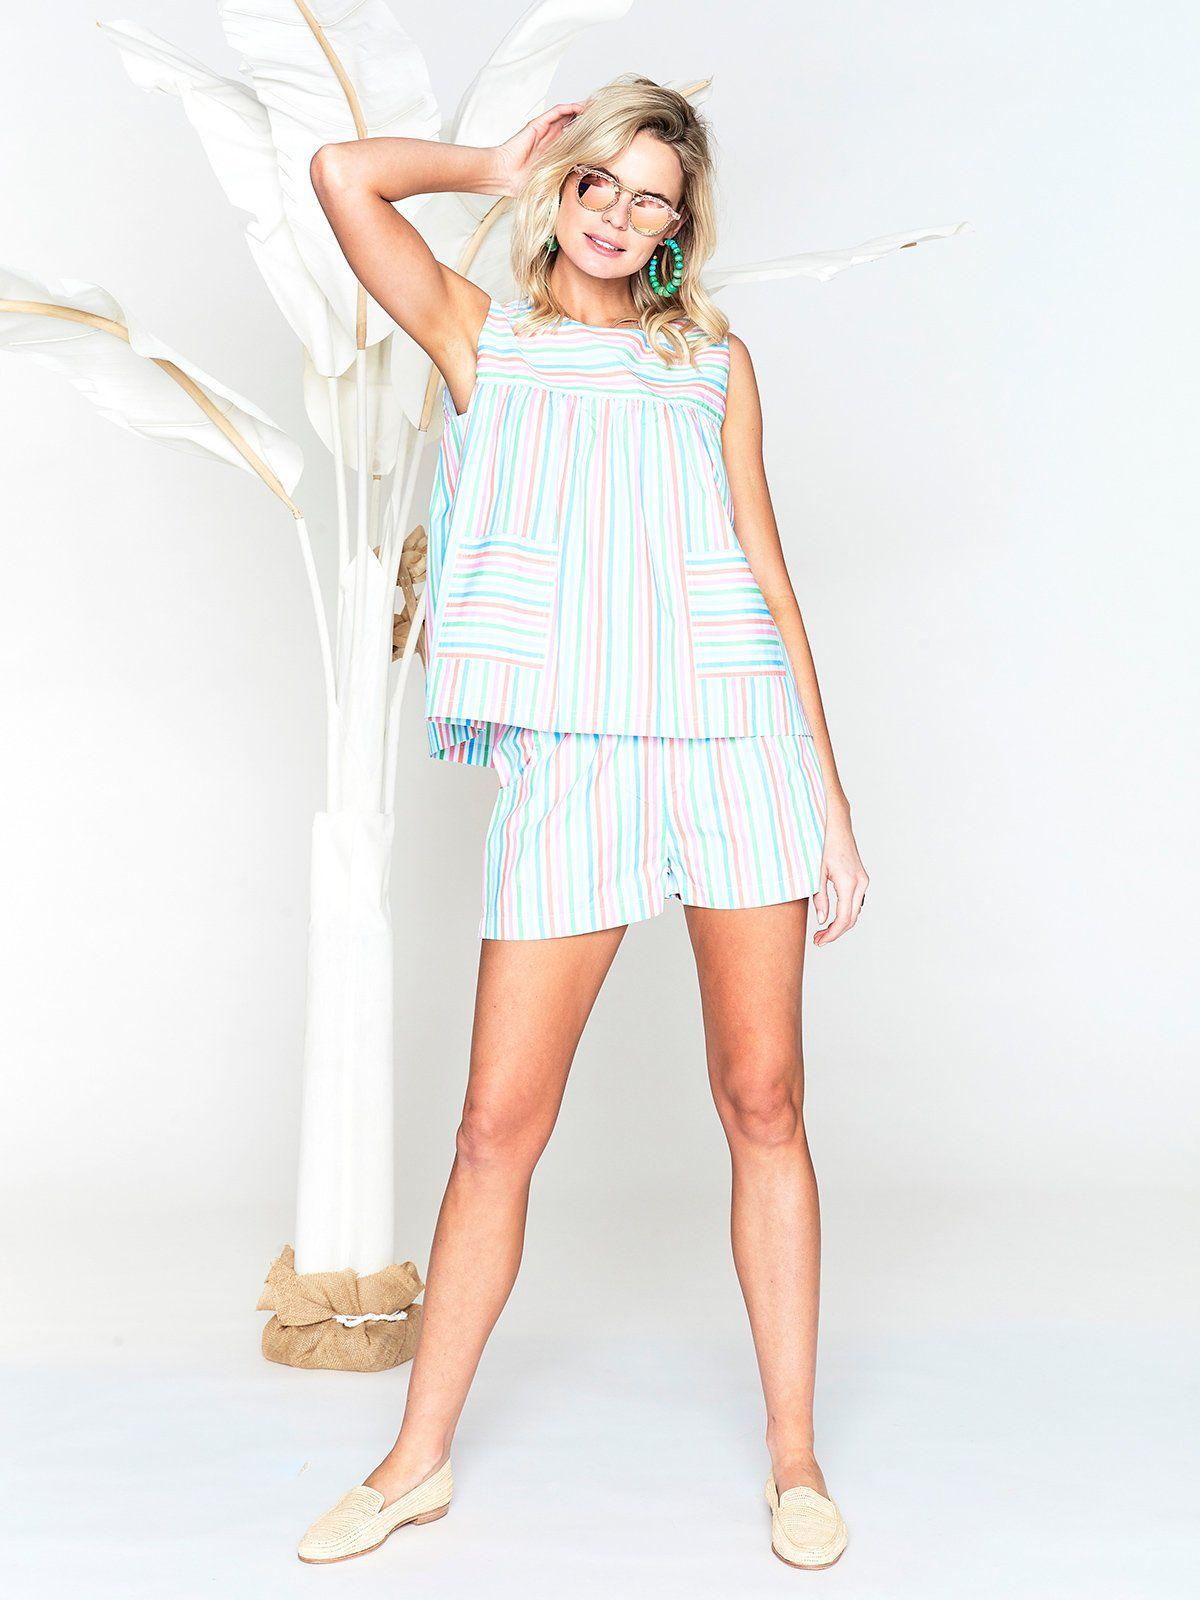 ORIGINAL CILER 2018 New Sexy Lingerie Women 100% Cotton